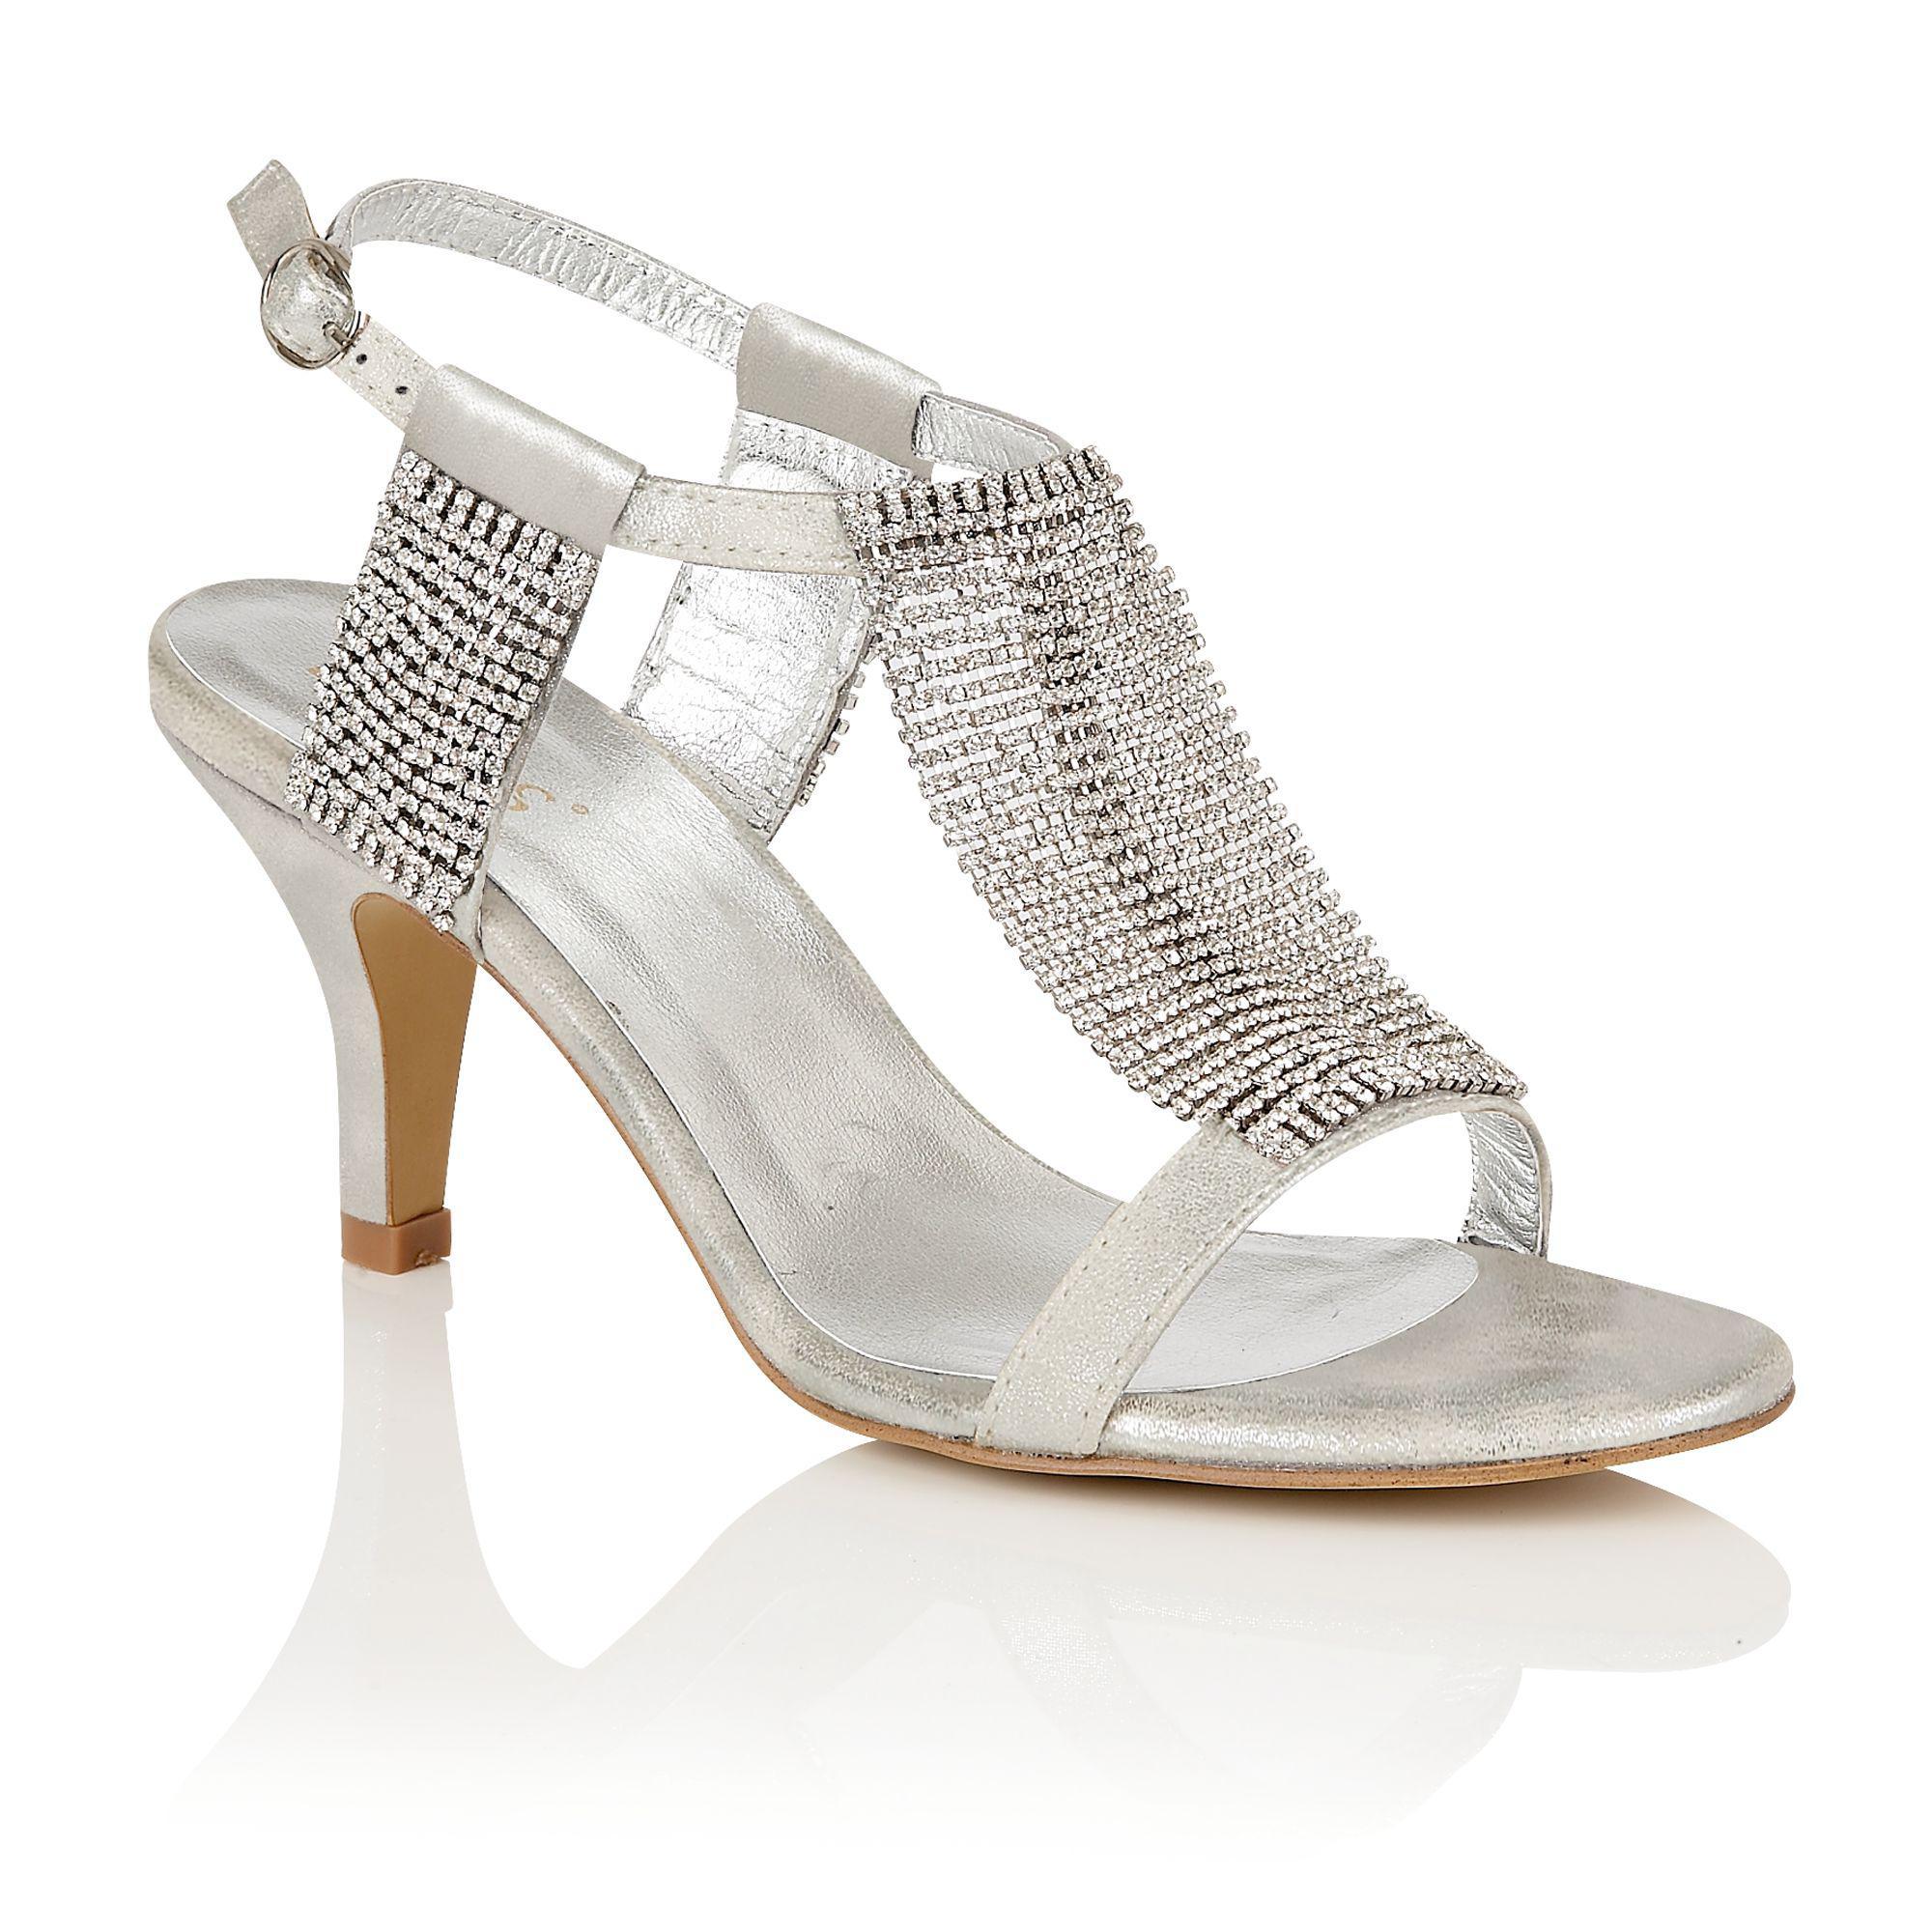 01eb88be319 Lotus Silver Diamante 'aspey' High Heel T-bar Sandals in Metallic - Lyst